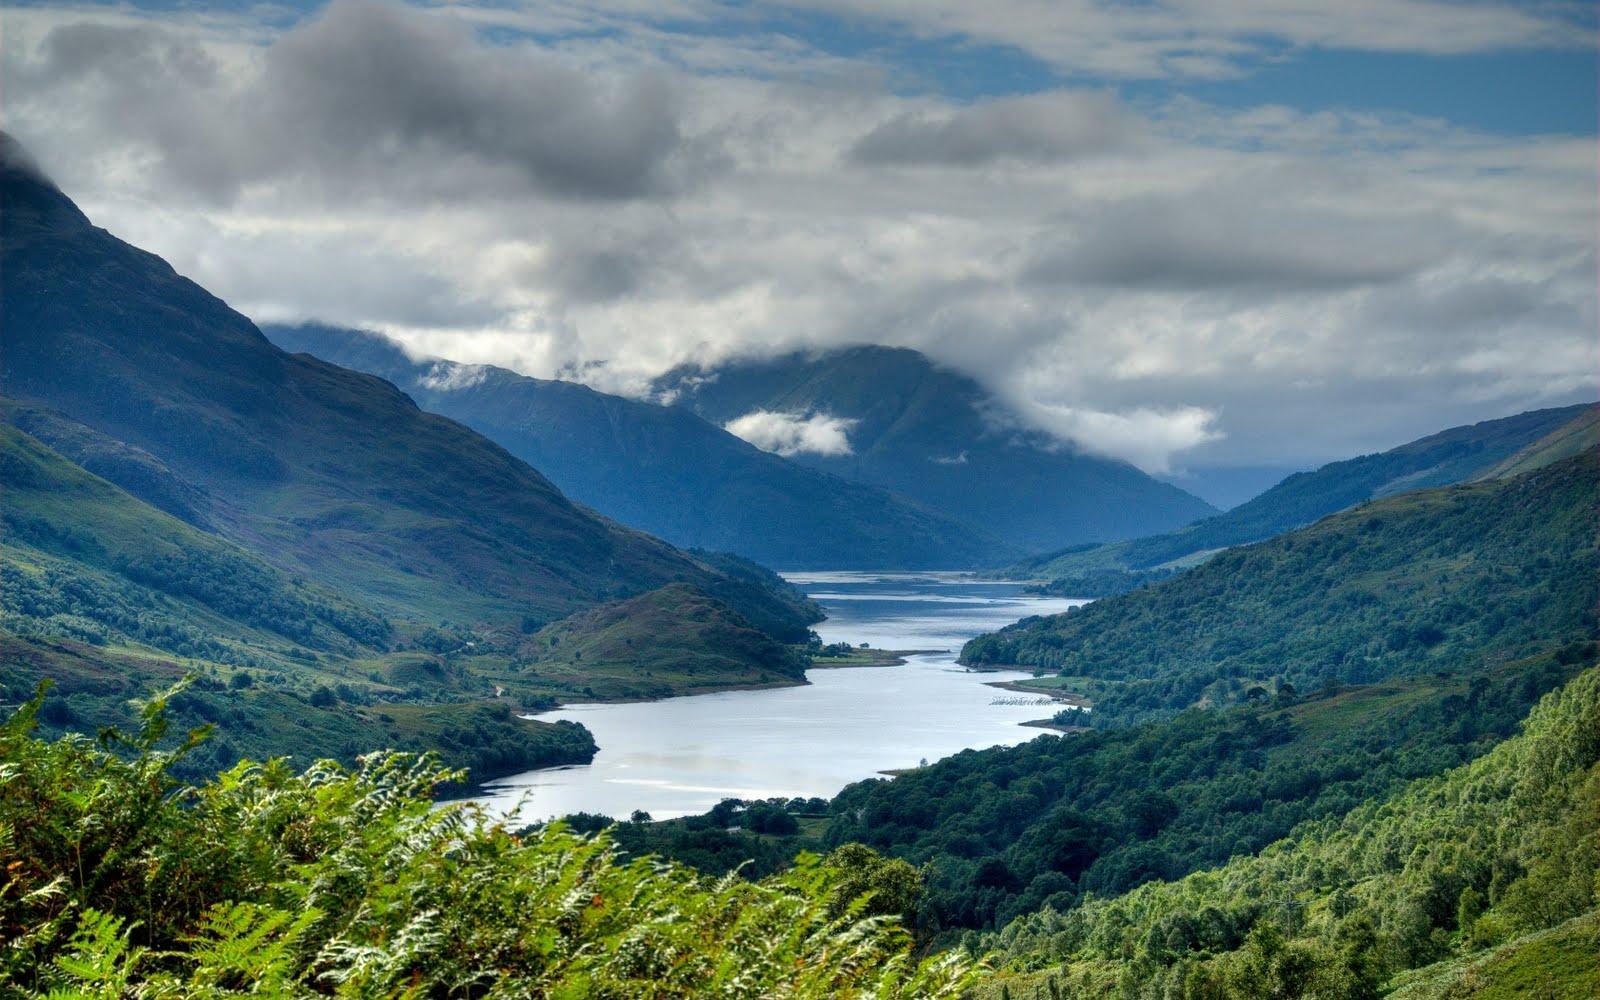 scotland - photo #34